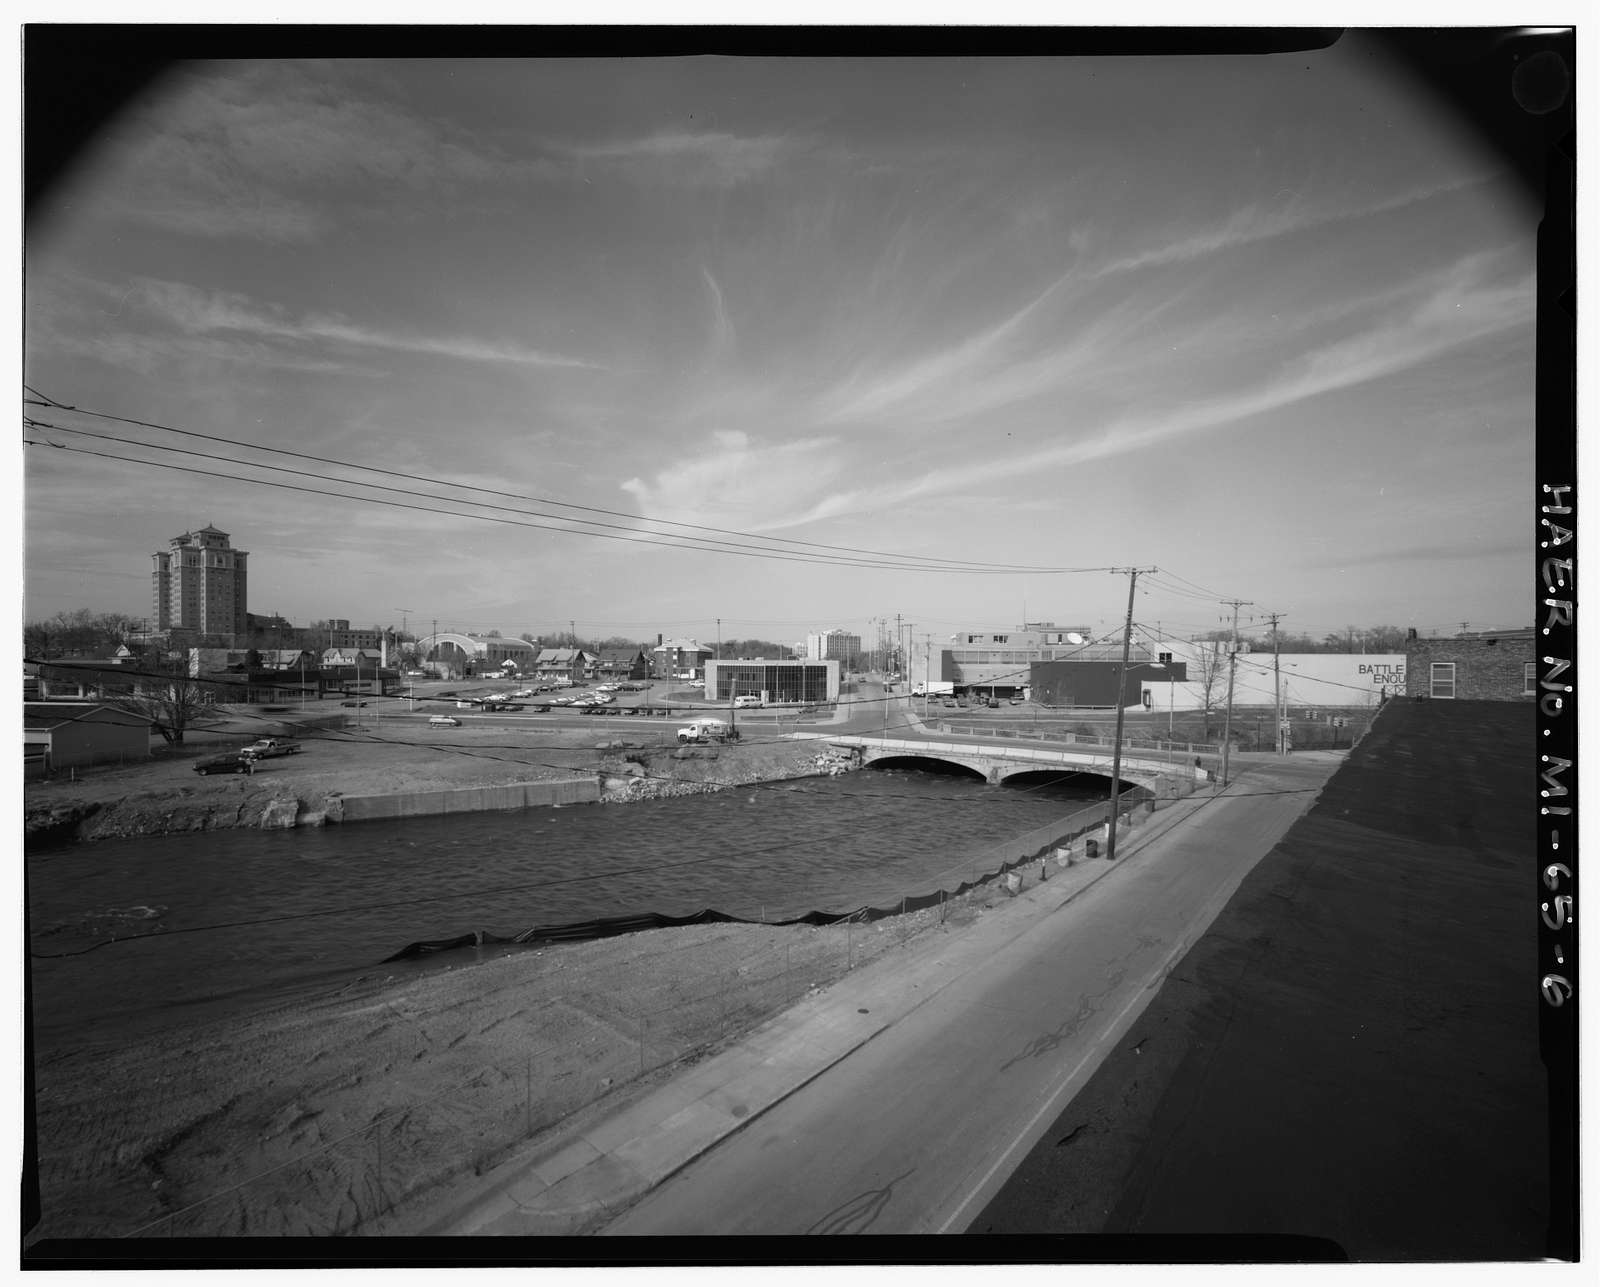 West Michigan Avenue Bridge, Spanning Battle Creek River, Battle Creek, Calhoun County, MI